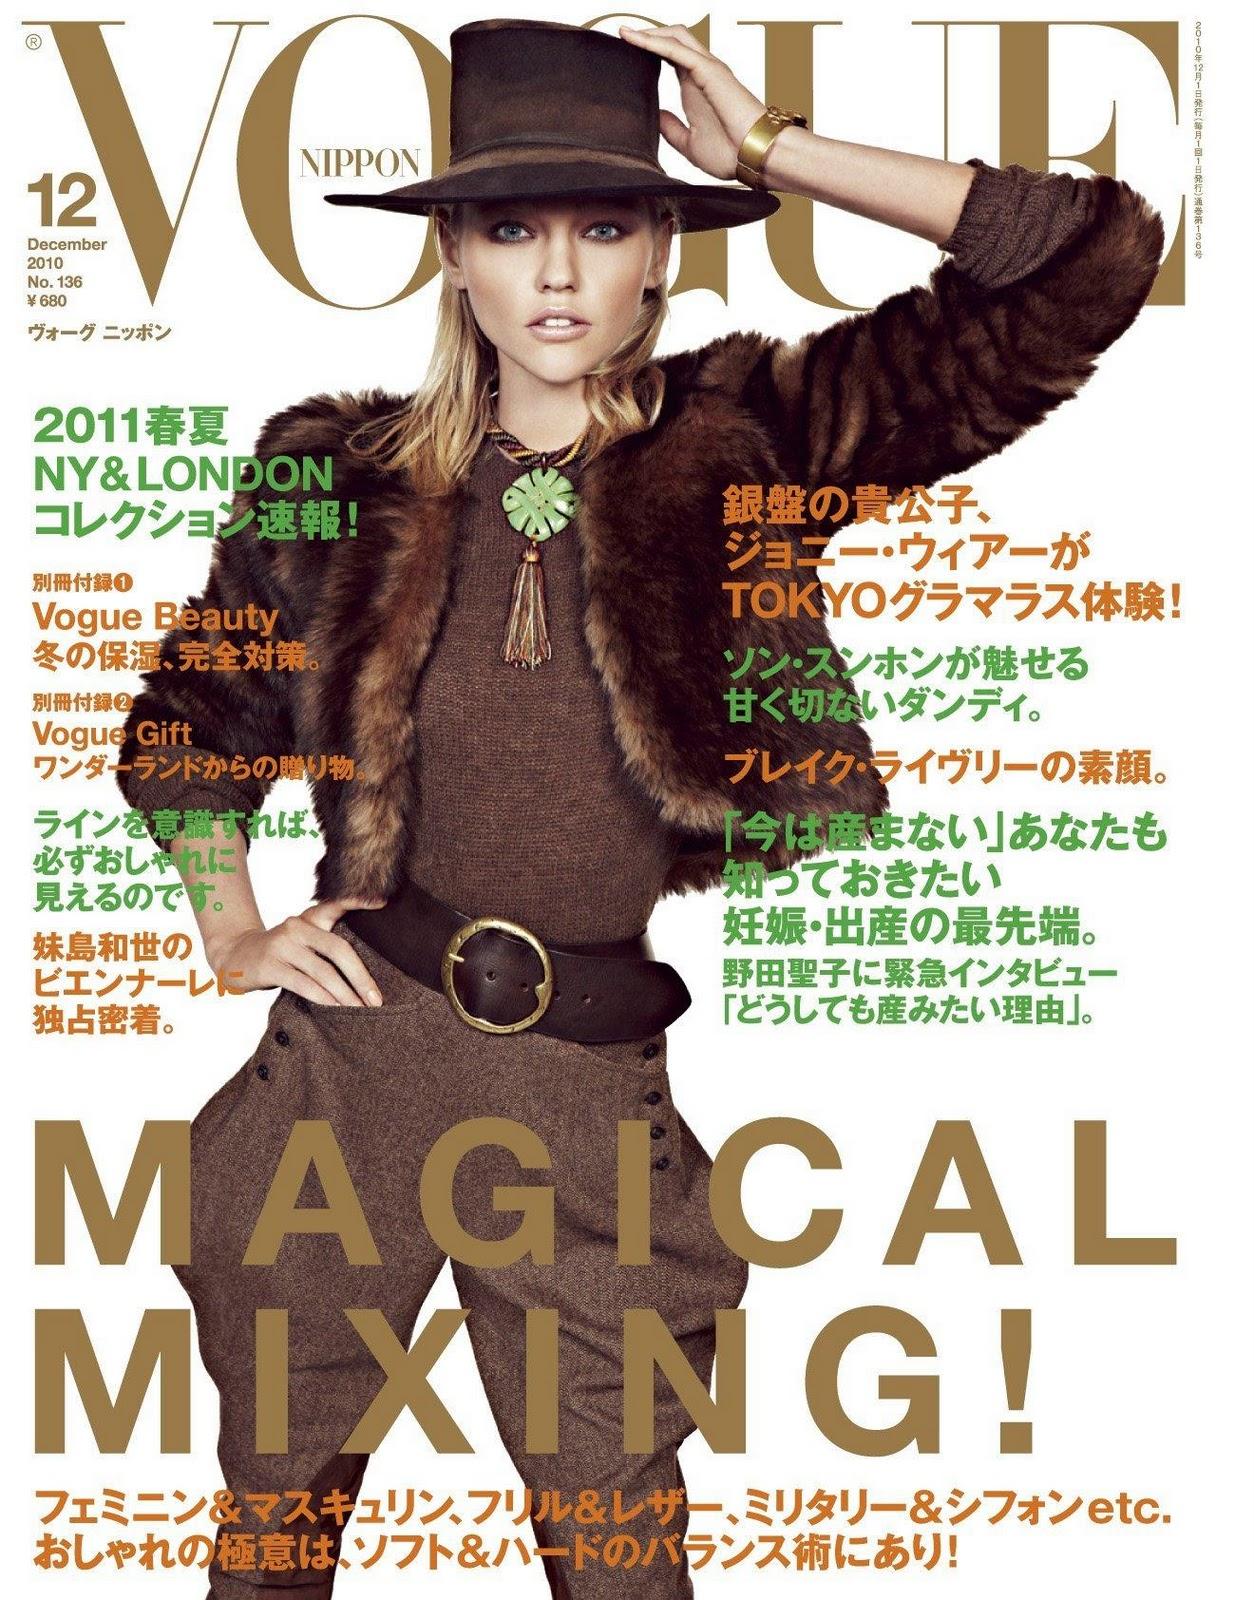 http://3.bp.blogspot.com/_T822rPXJtGU/TL7jn_V4nMI/AAAAAAAAAcs/uZmmj70waNk/s1600/Vogue+Nippon+December+2010++Sasha+Pivovarova+by+Inez+&+Vinoodh.jpg